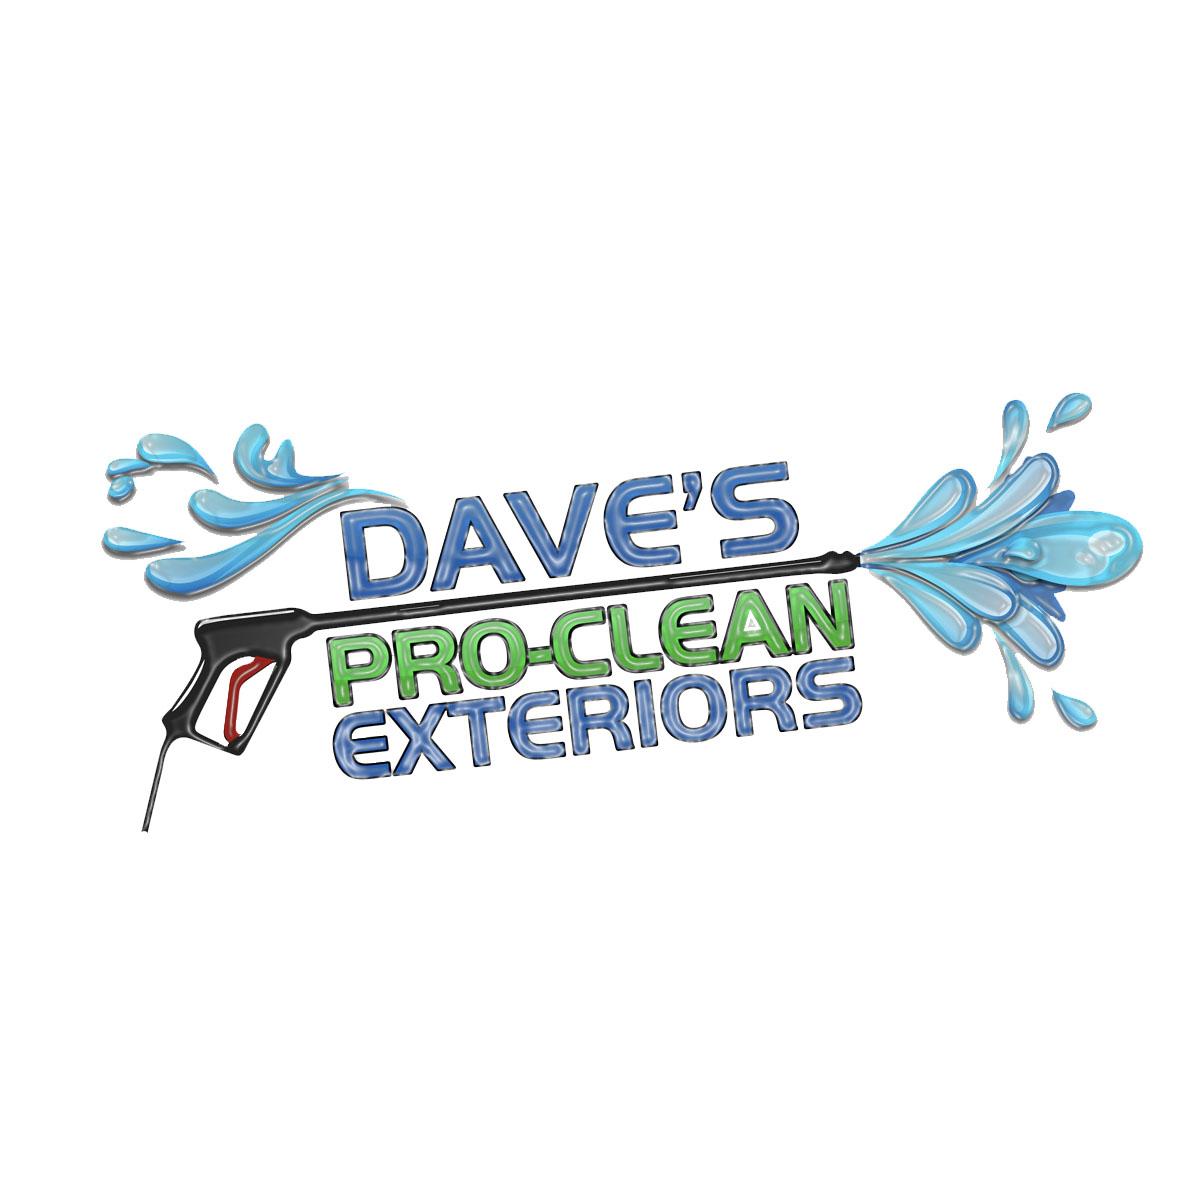 Dave's Pro Clean Exteriors